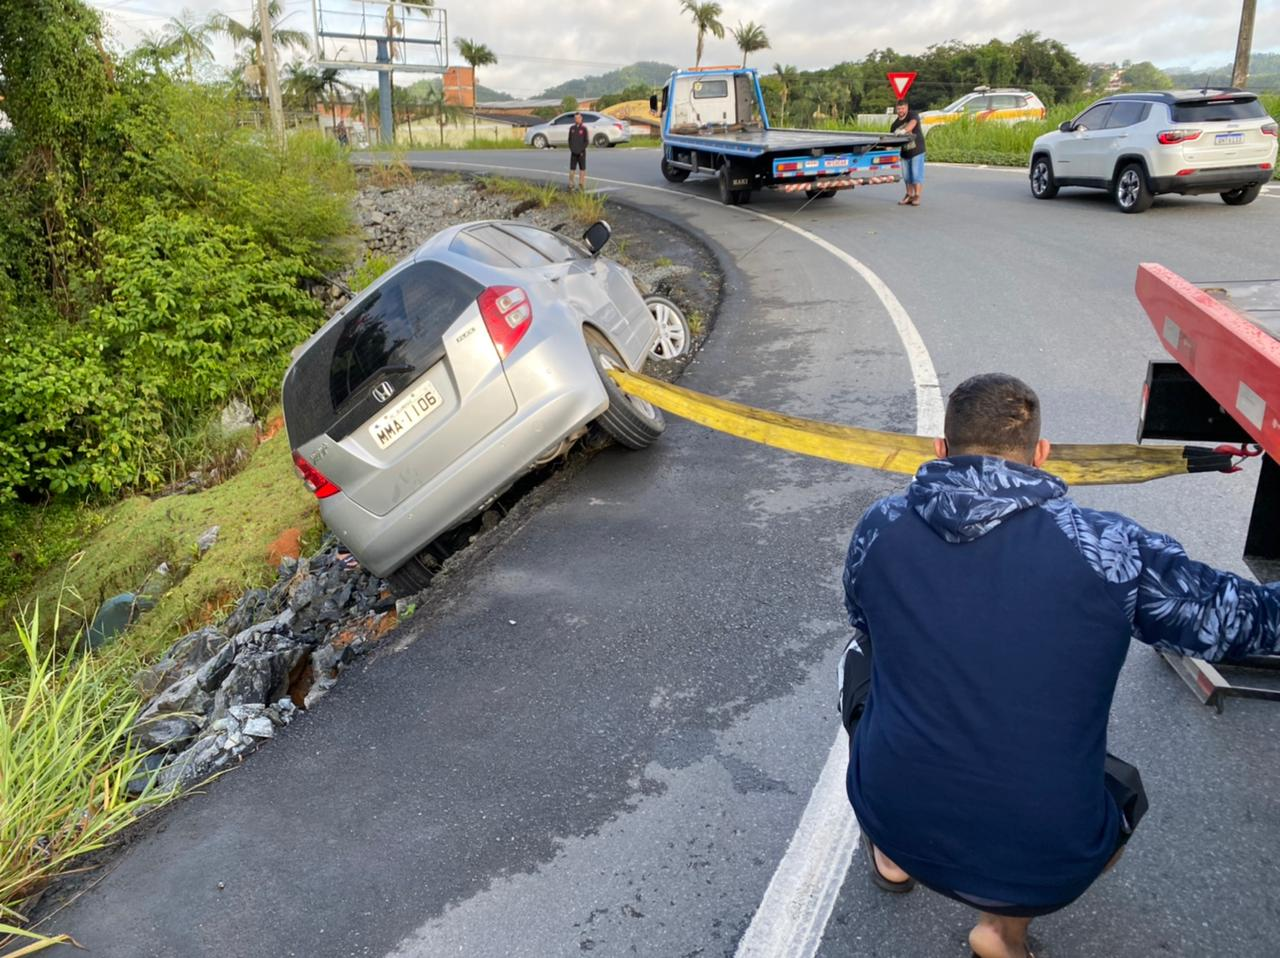 Motorista que levava o filho para a escola perdeu o controle e saiu da pista - Moisés Stuker/NDTV Blumenau